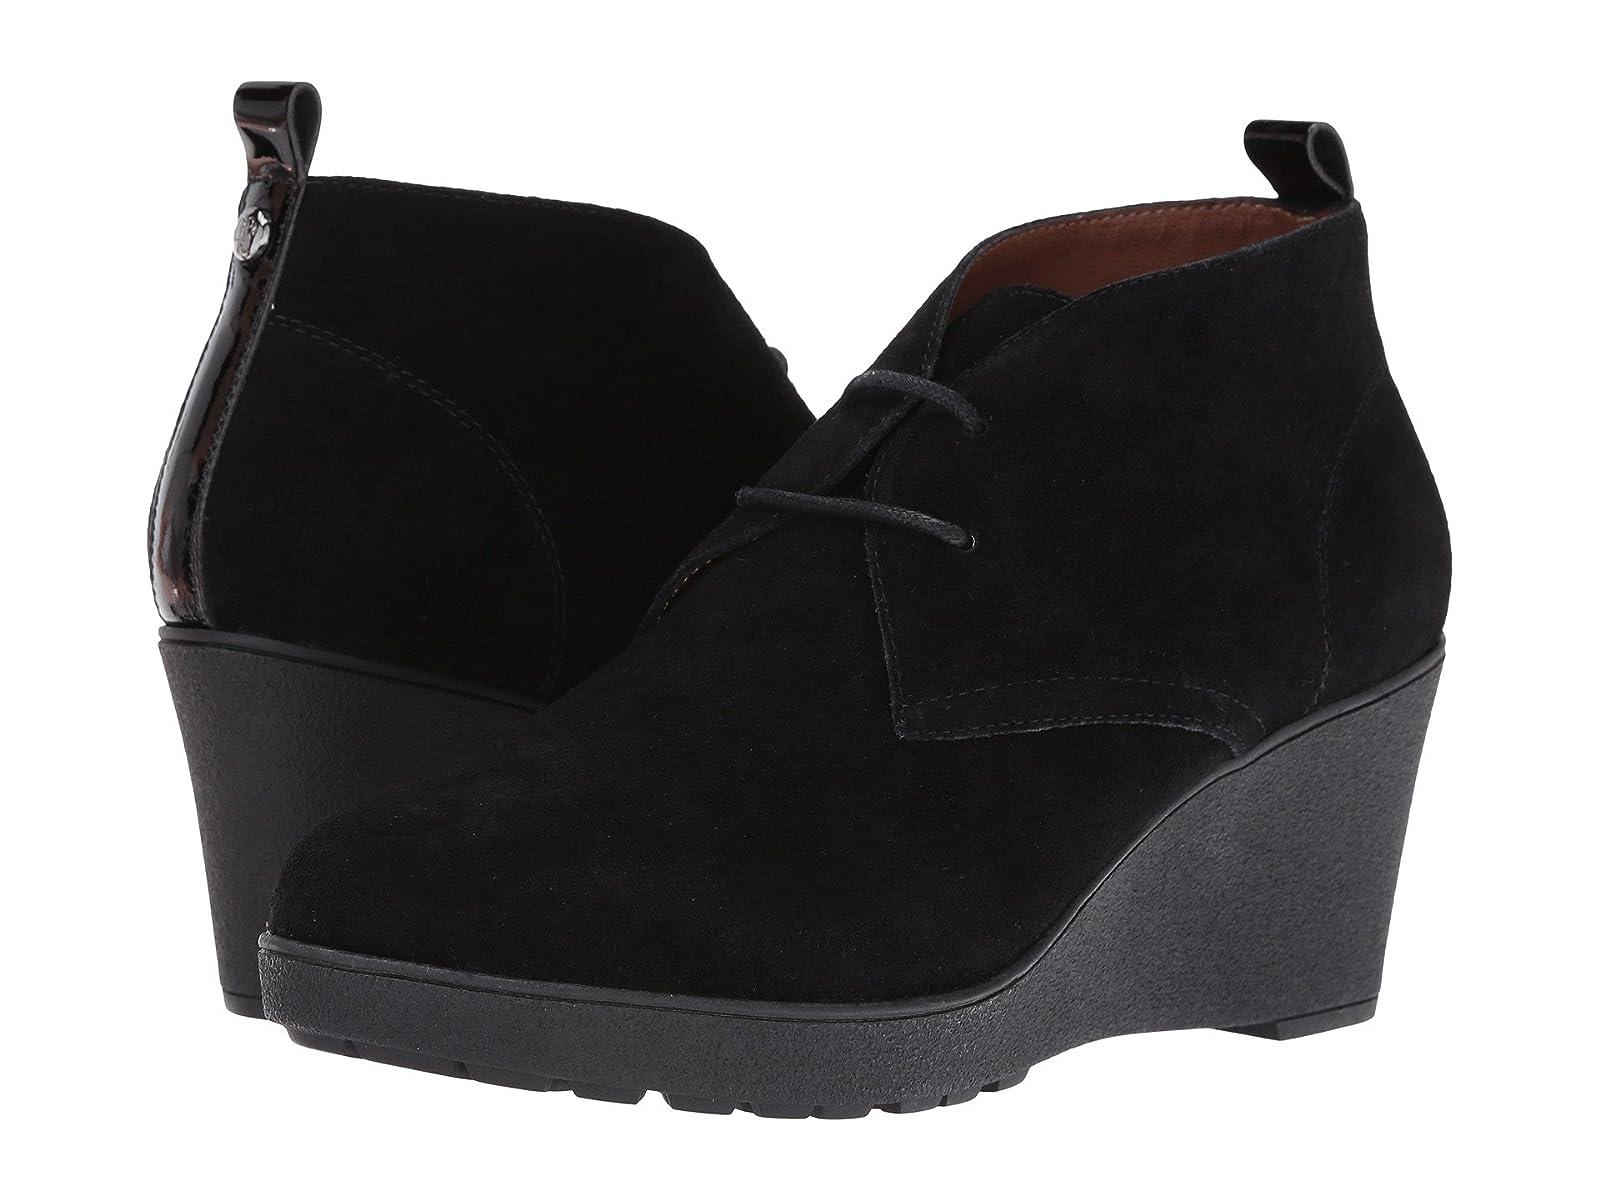 Donald J Pliner NakkaCheap and distinctive eye-catching shoes